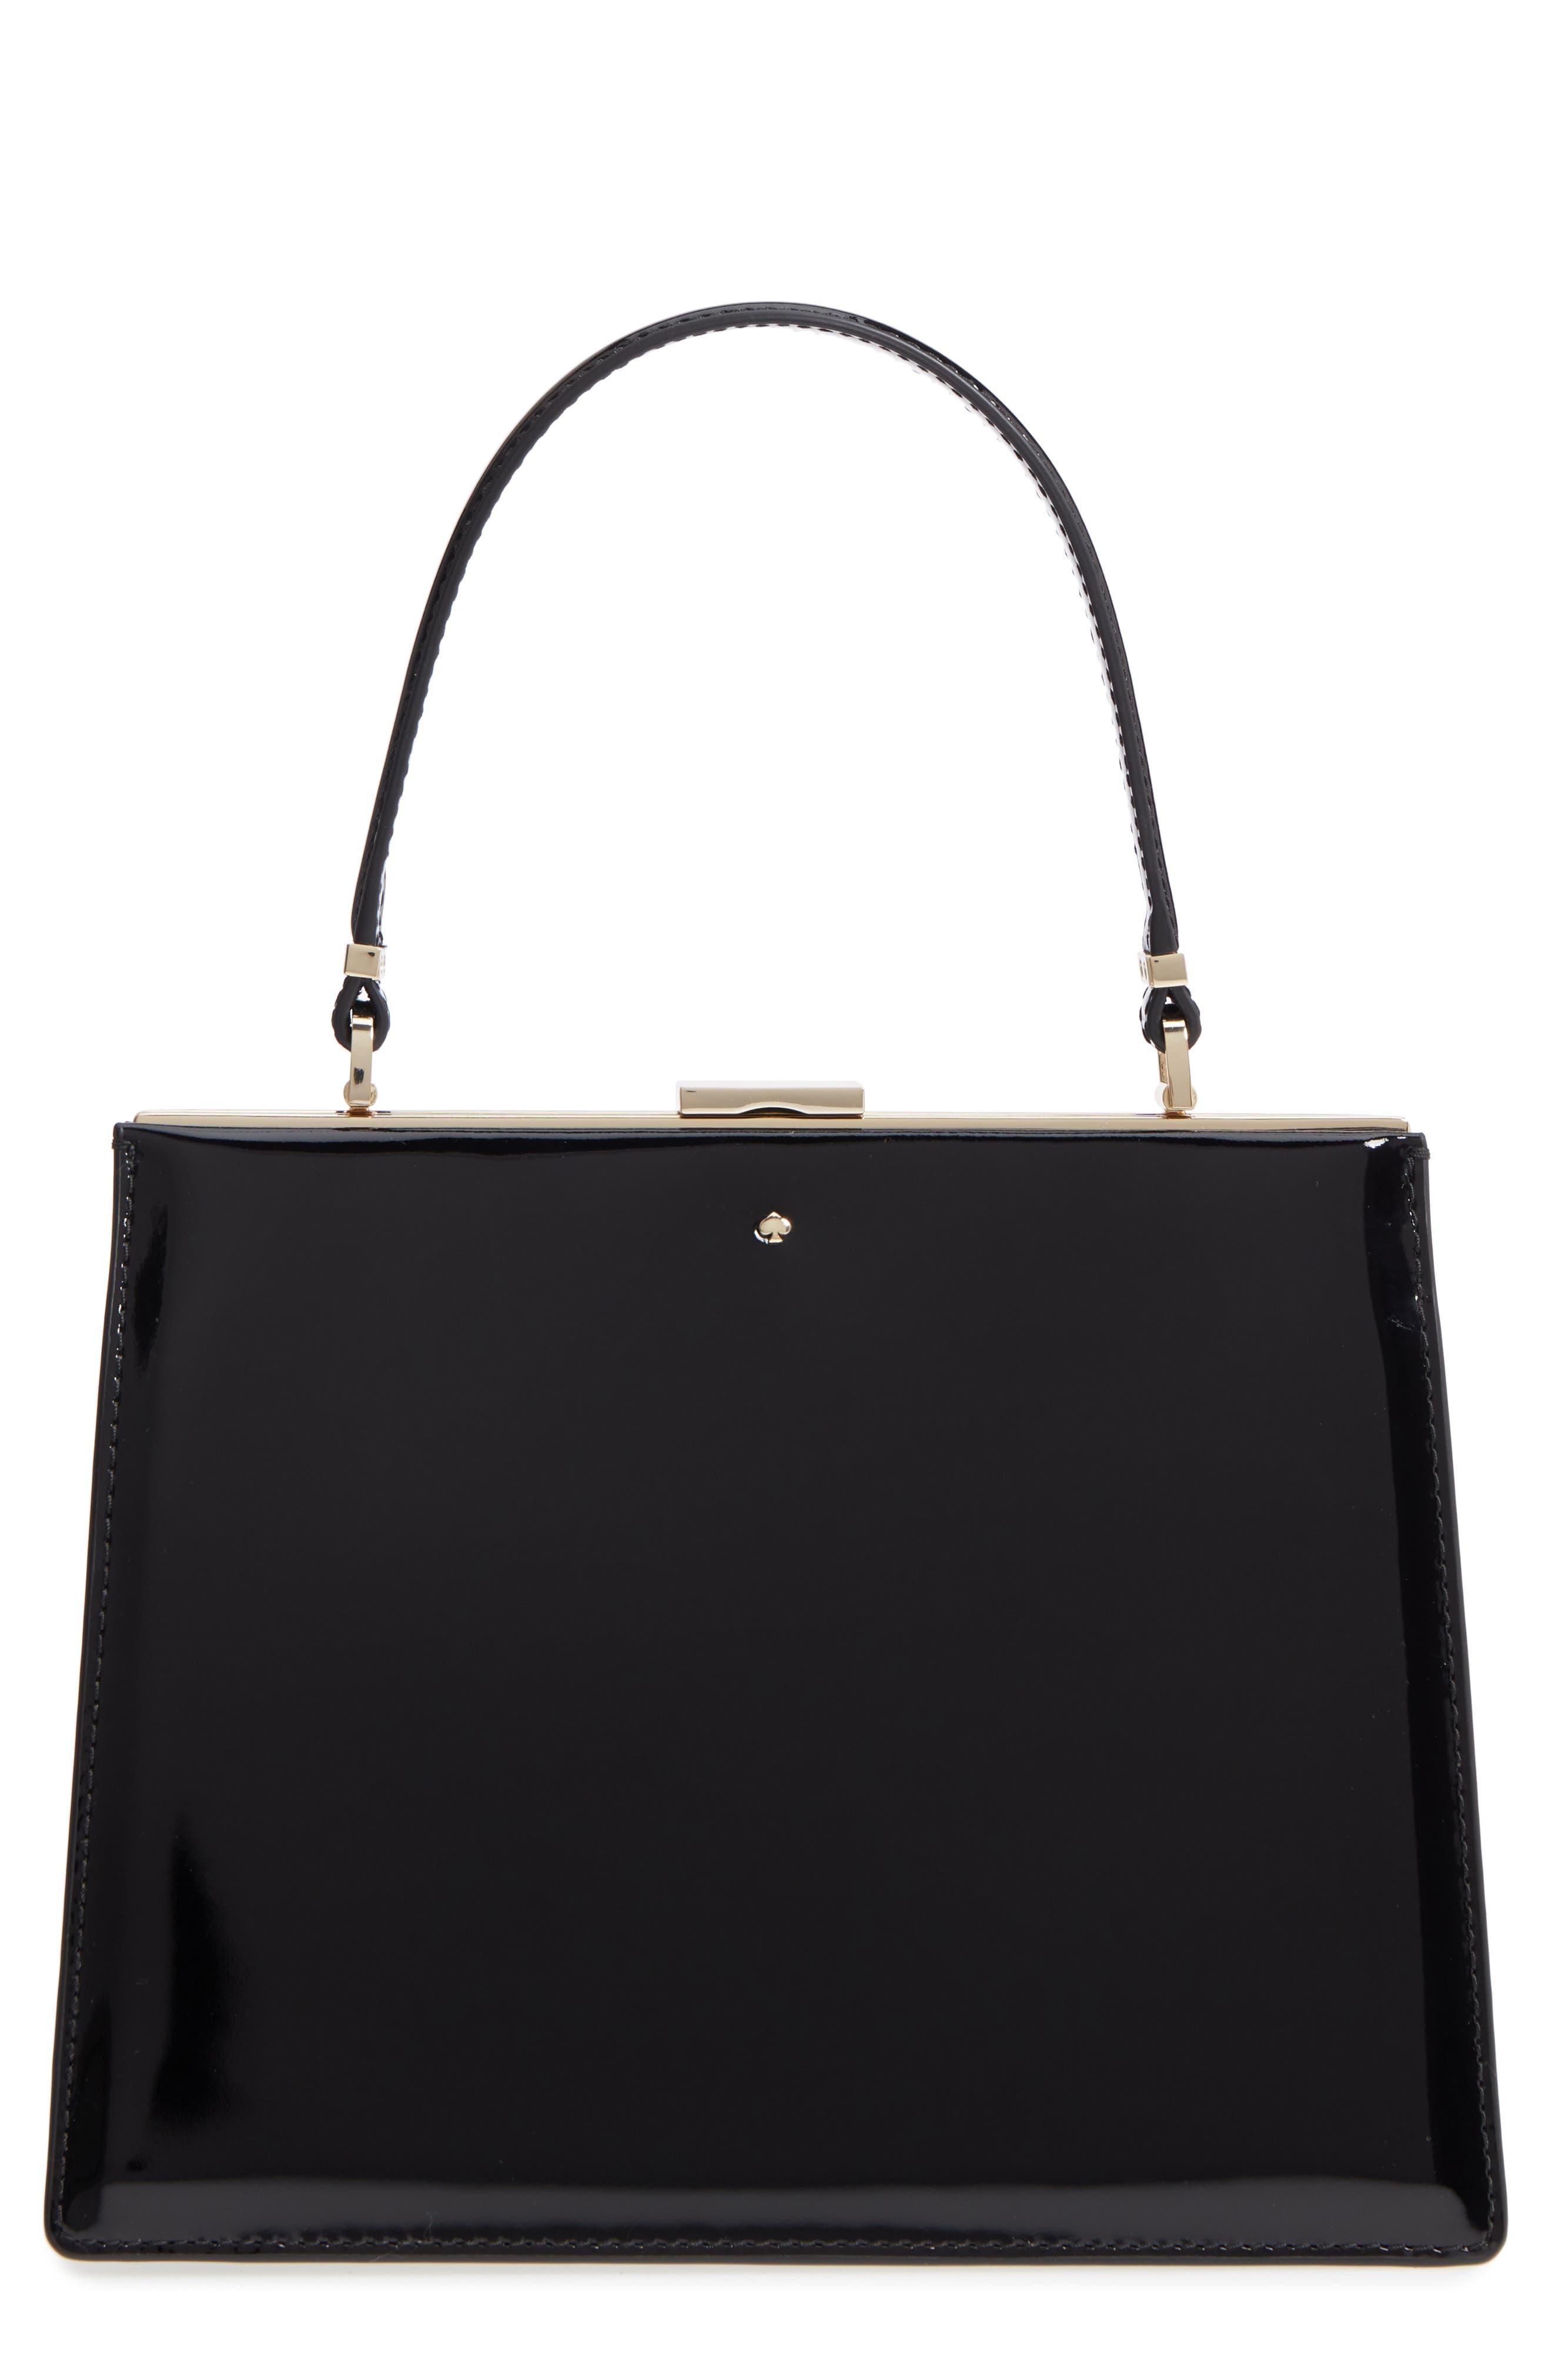 Alternate Image 1 Selected - kate spade new york madison moore road - chari leather handbag